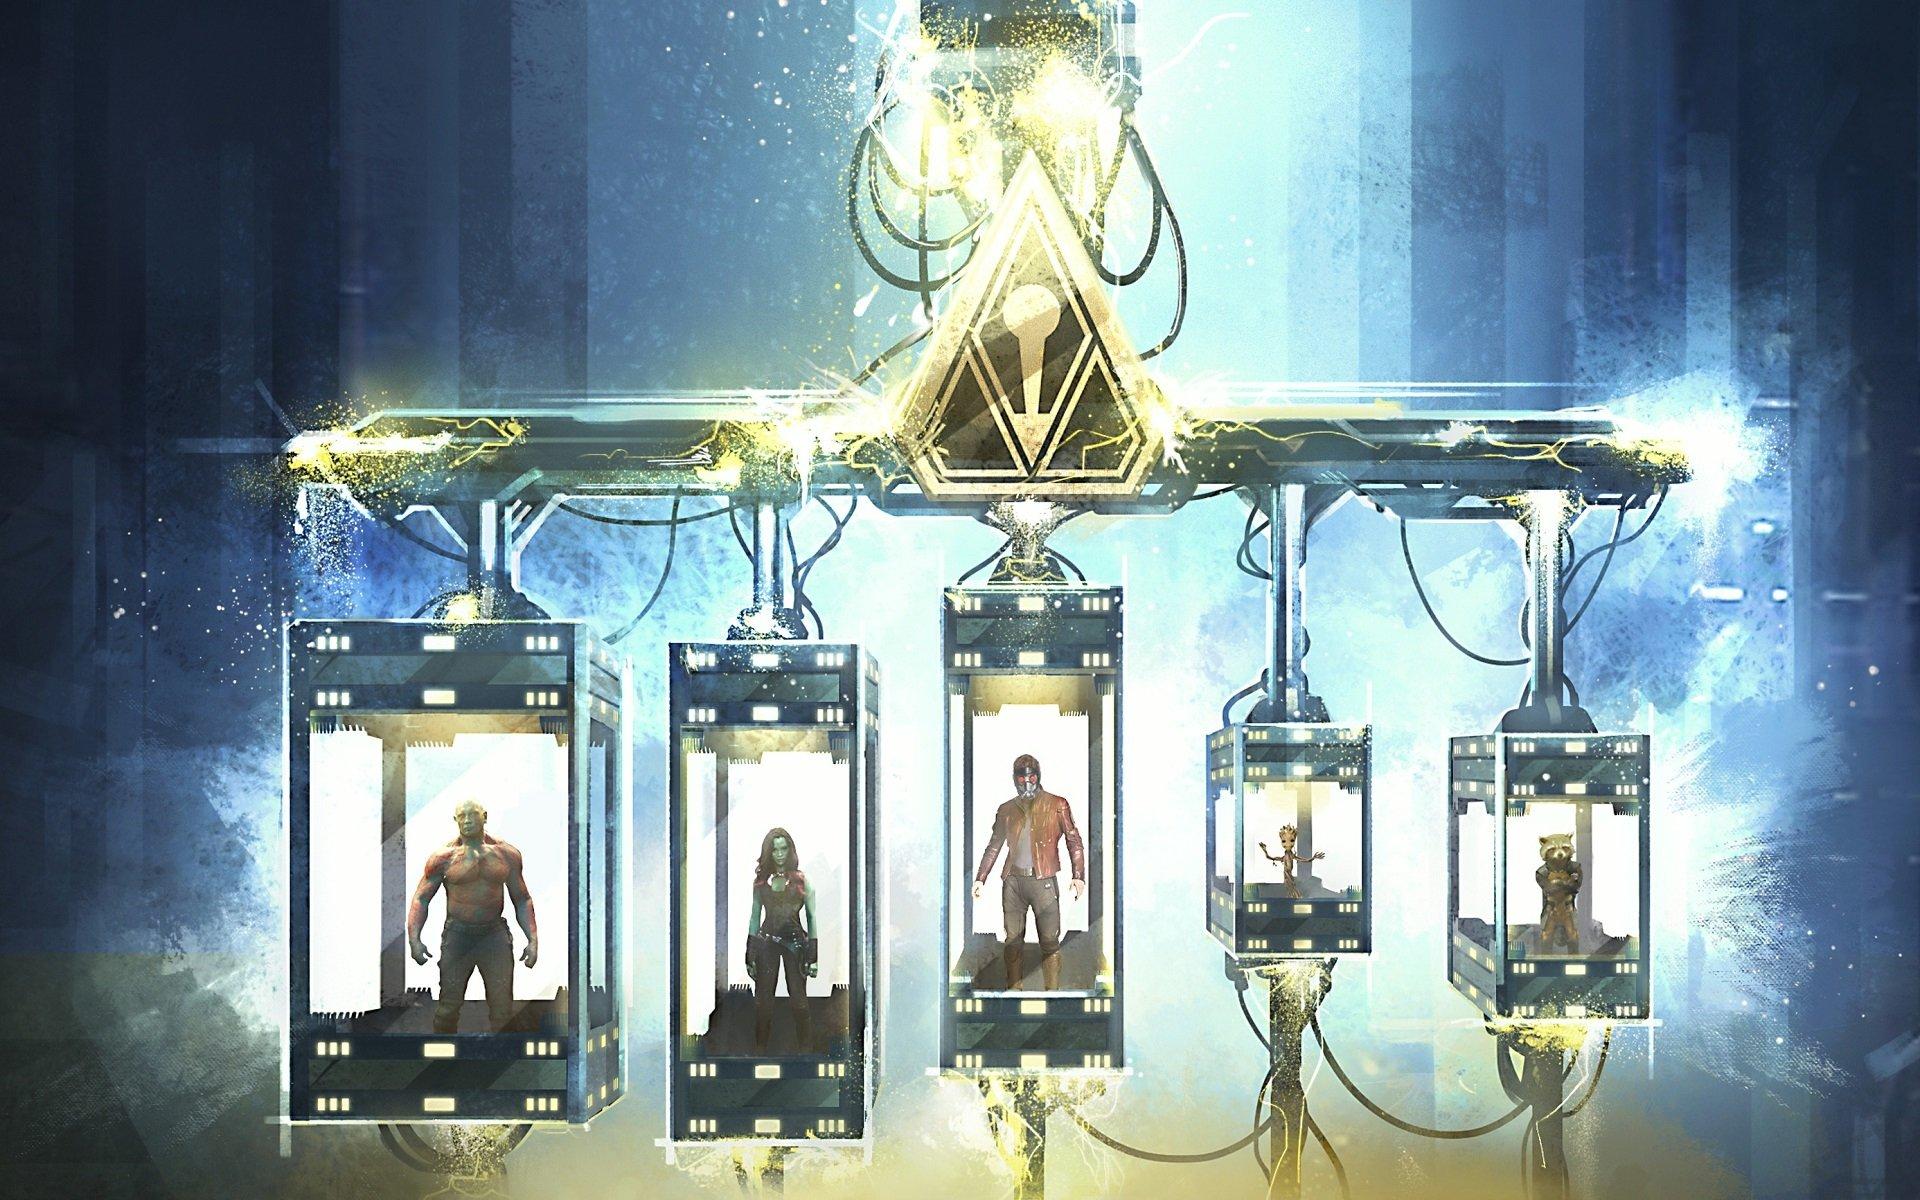 Movie - Guardians of the Galaxy Vol. 2  Chris Pratt Zoe Saldana Dave Bautista Gamora Star Lord Groot Rocket Raccoon Drax The Destroyer Wallpaper